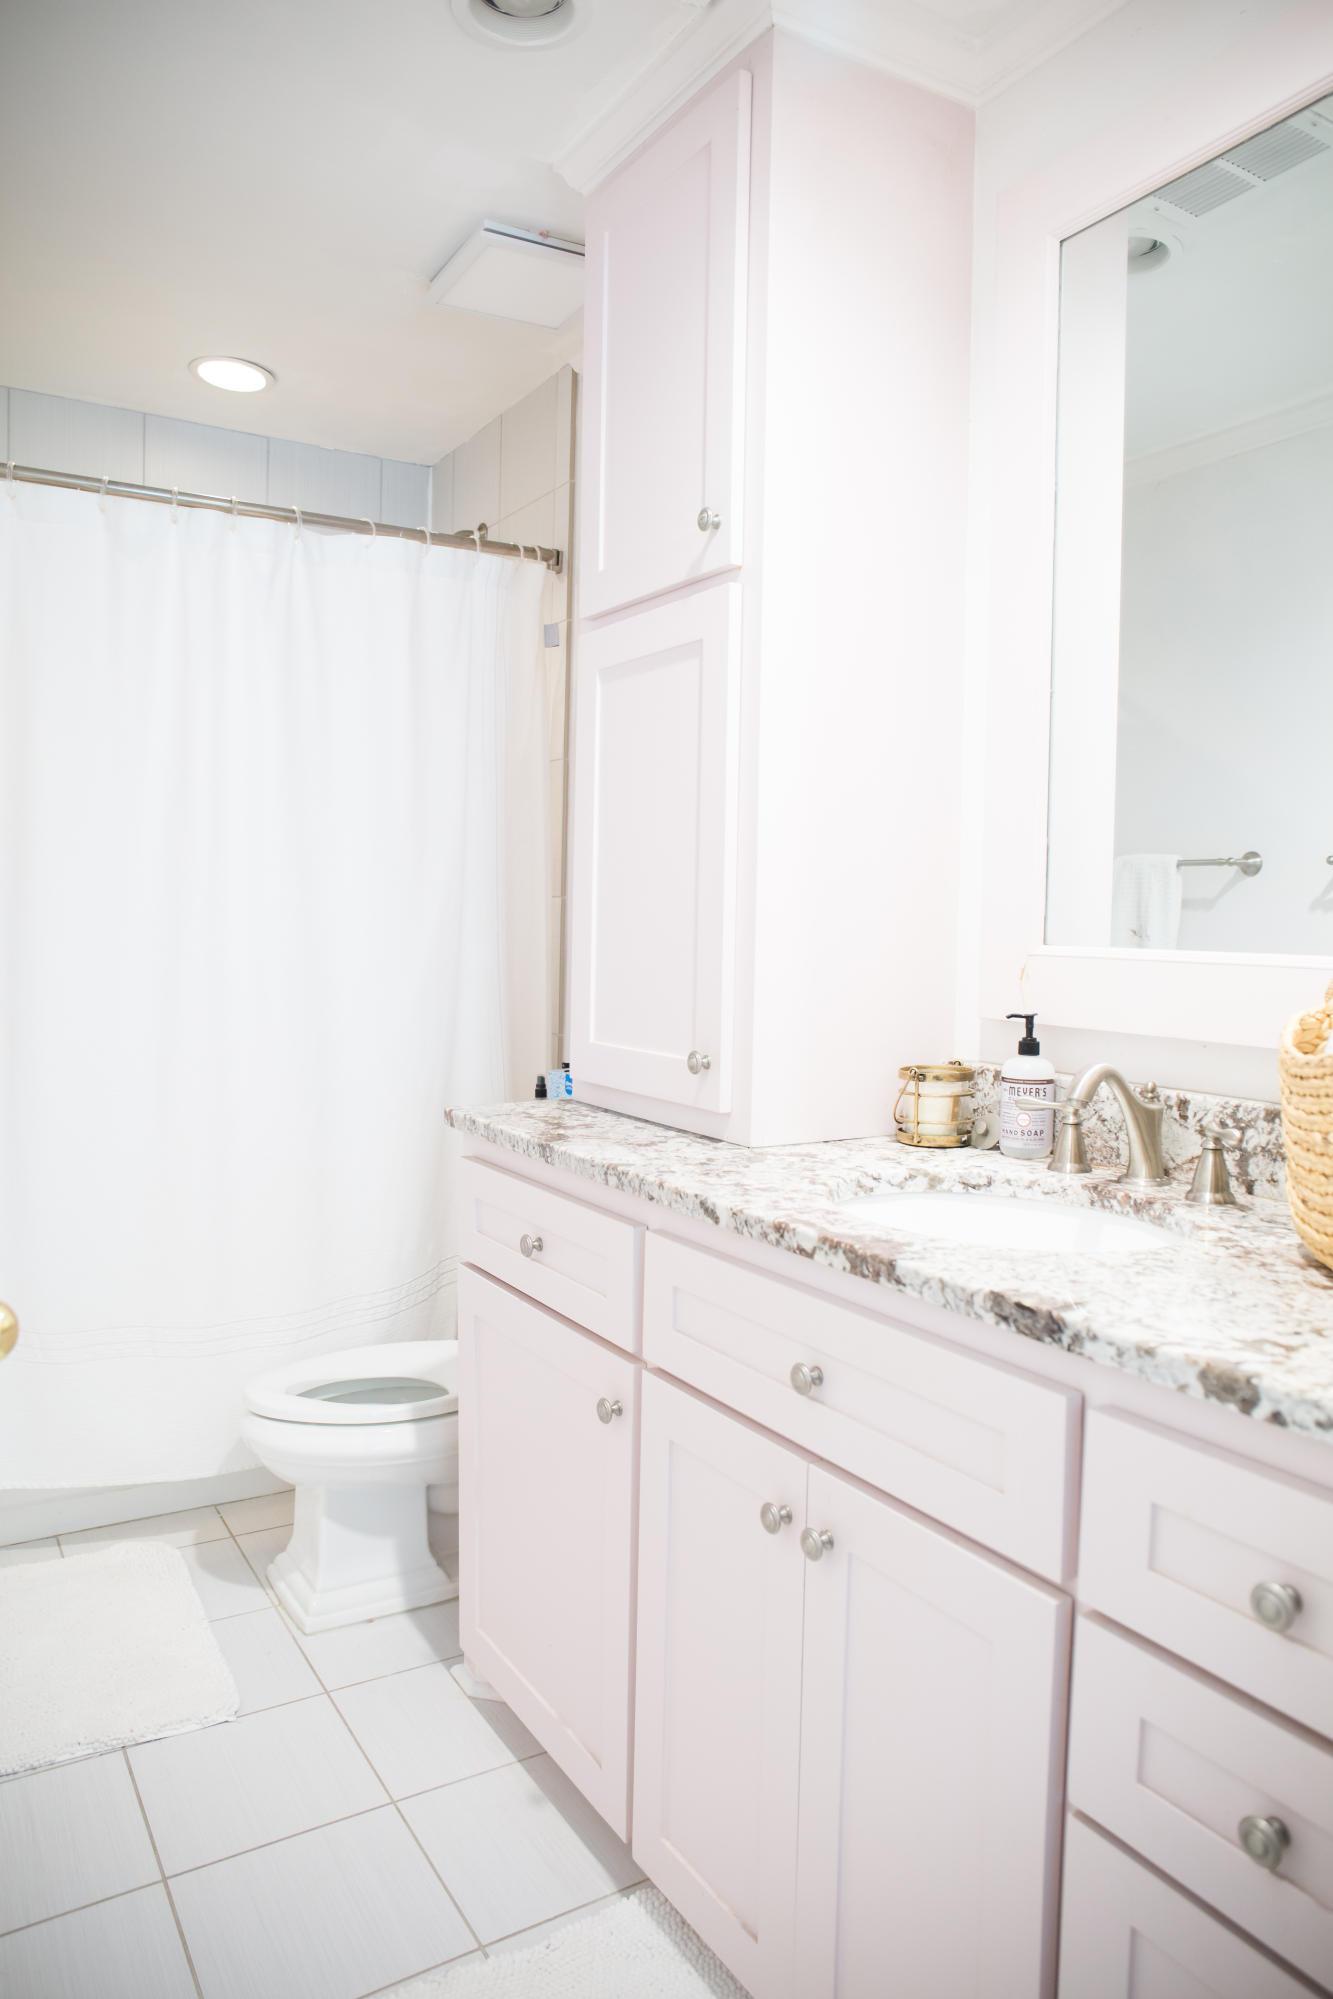 Crown Pointe Homes For Sale - 1502 Diamond, Mount Pleasant, SC - 20